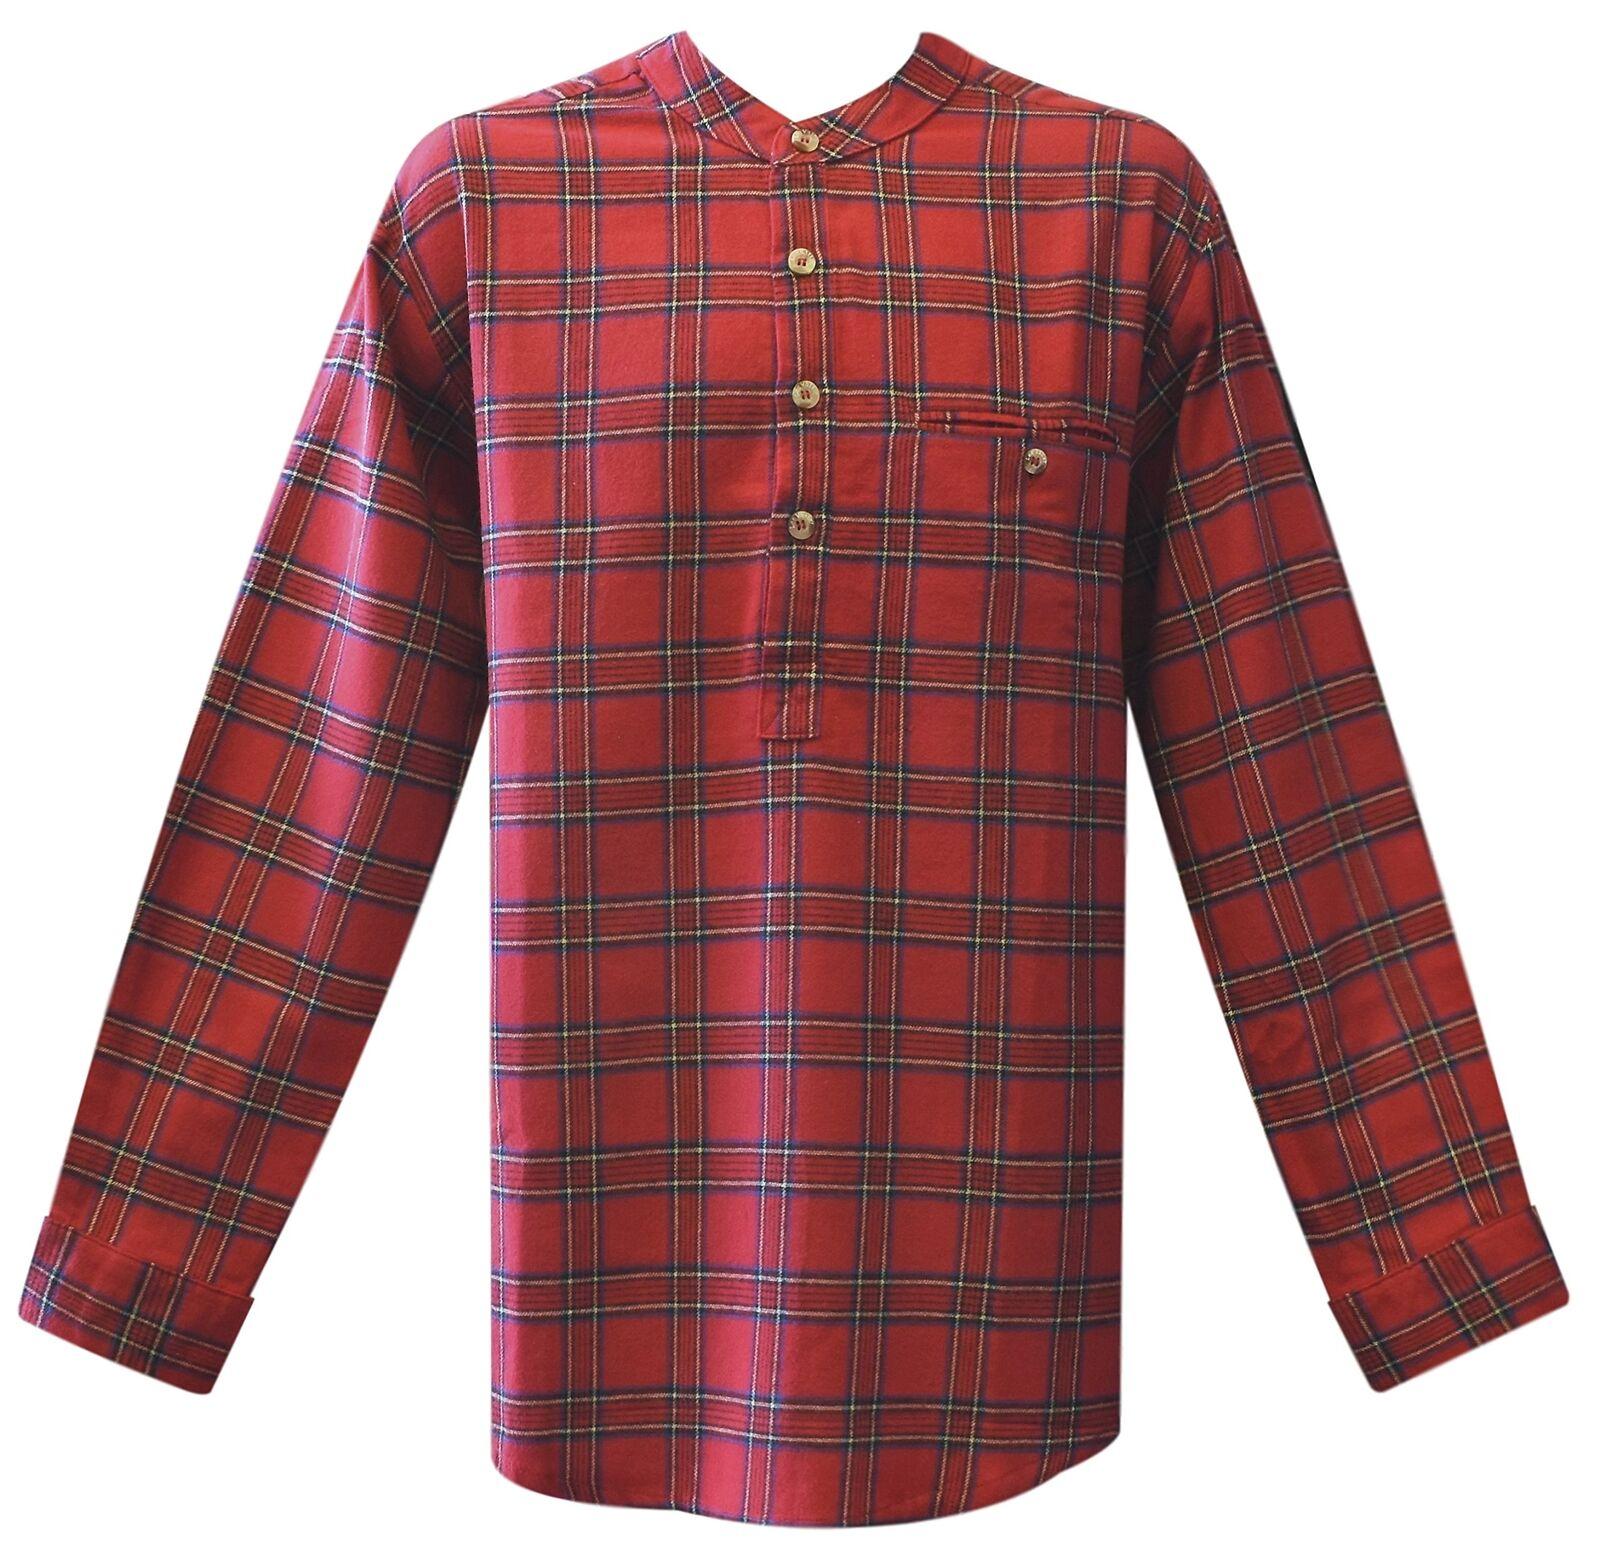 Lee Valley - Men's Genuine Irish Cotton Flannel Grandfather Shirt - Red - Large